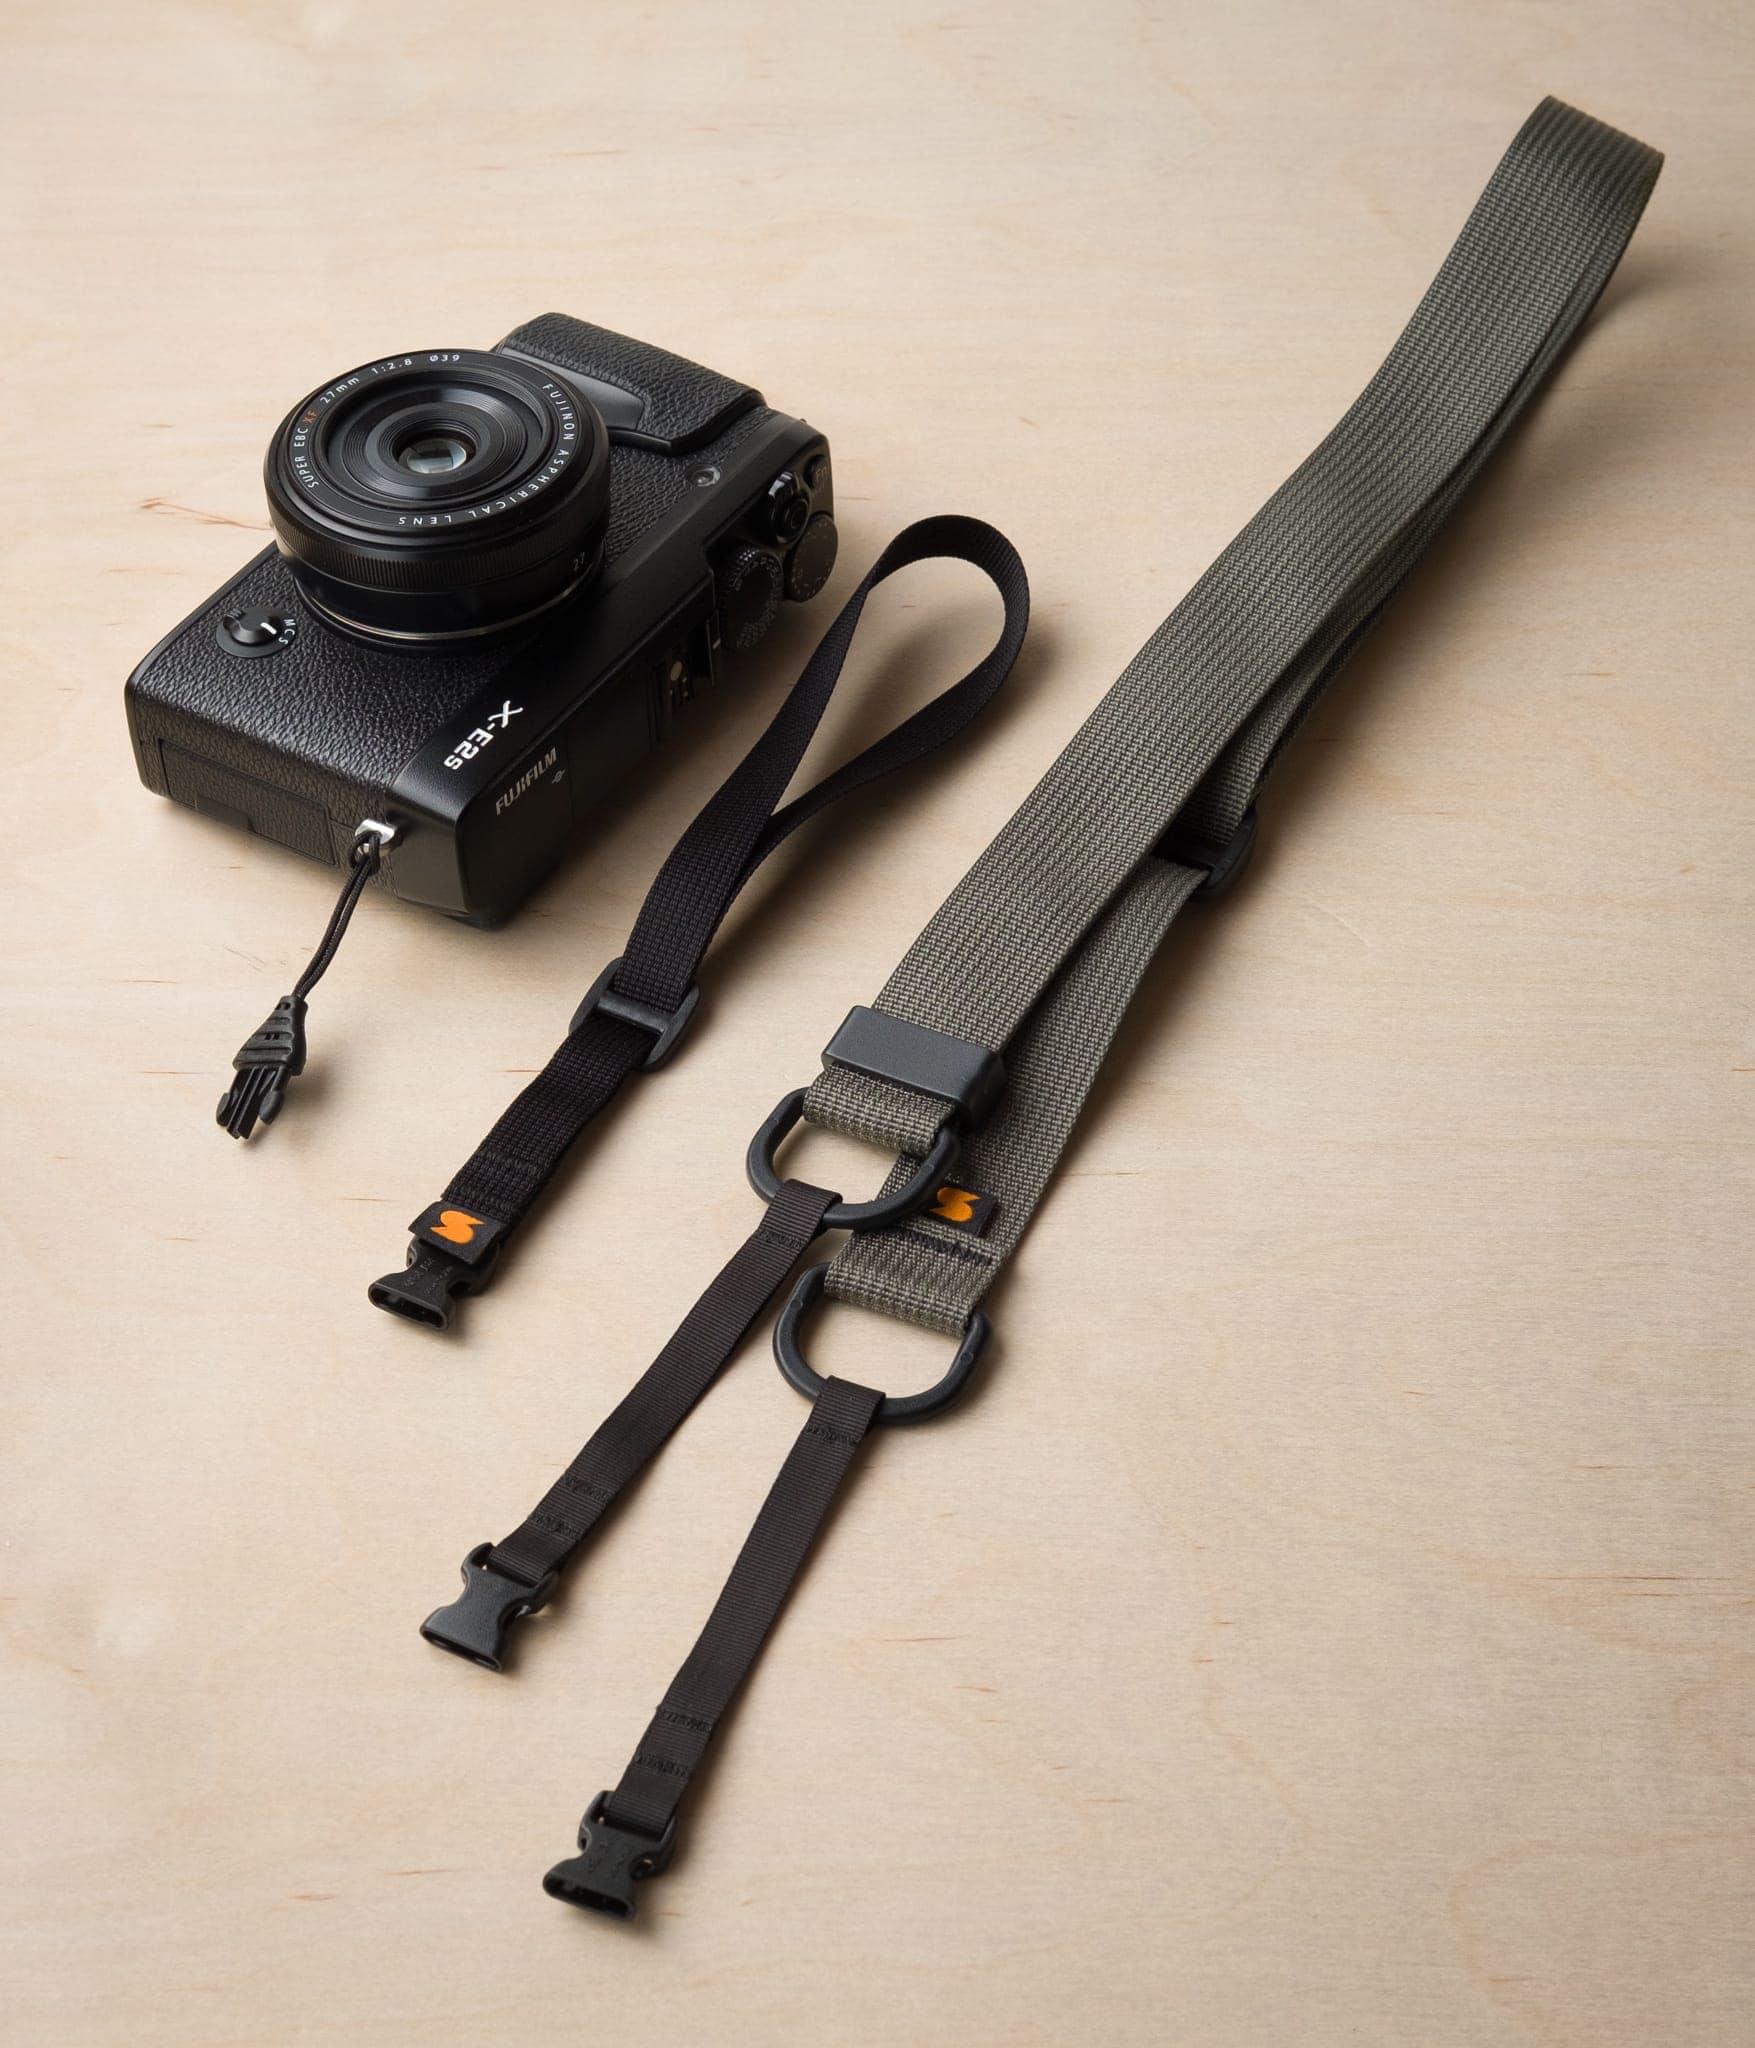 Siri M1 cepat cermin kamera leher tali leher dan tali pergelangan tangan